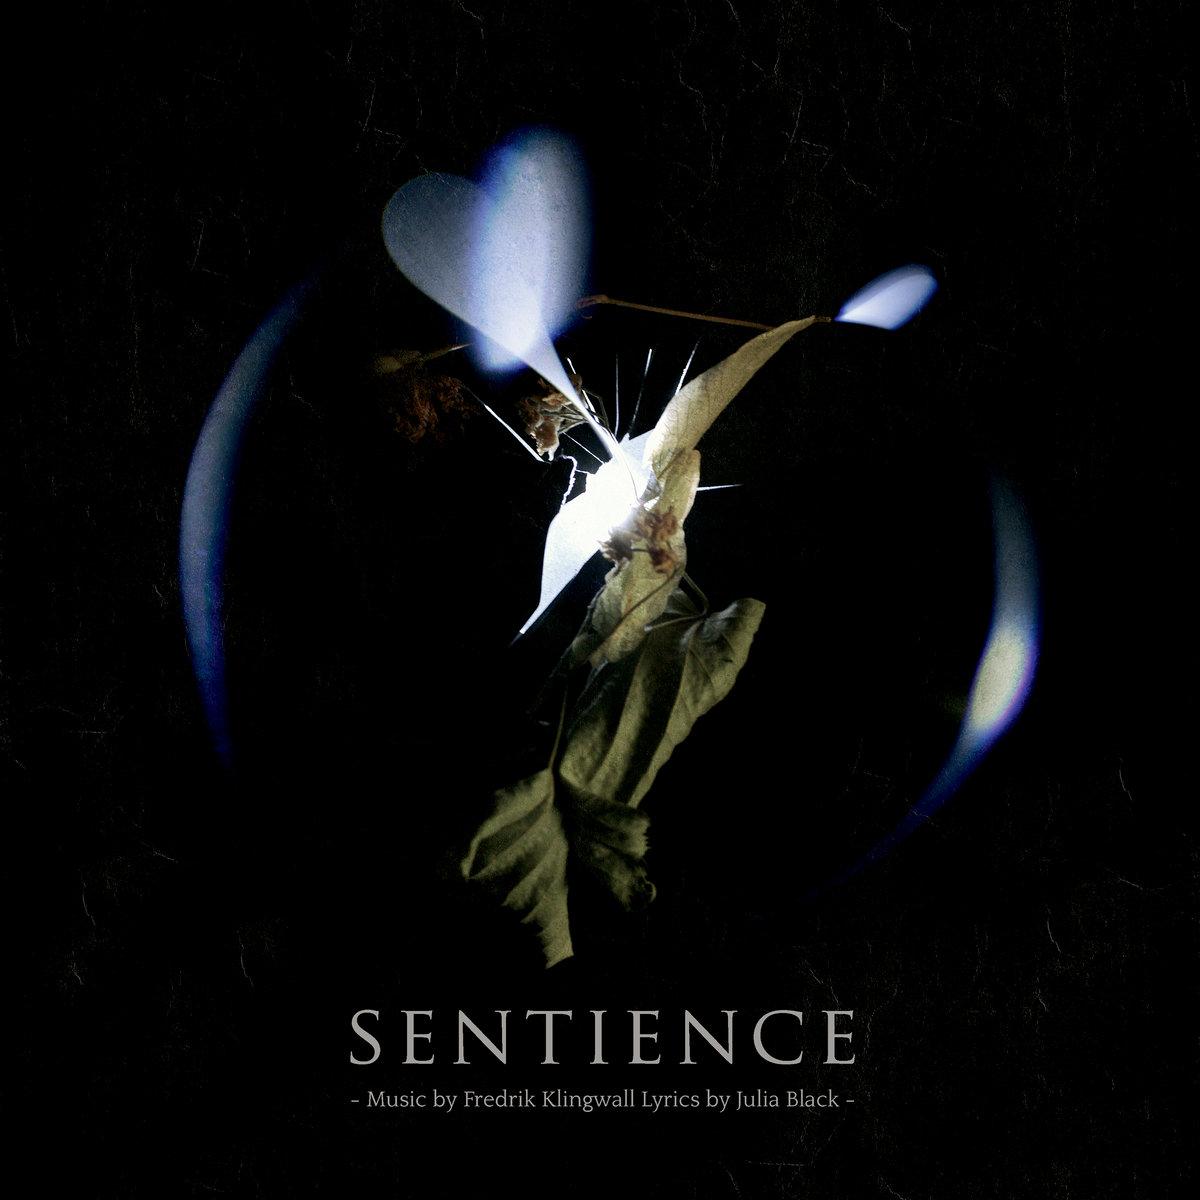 Sentience